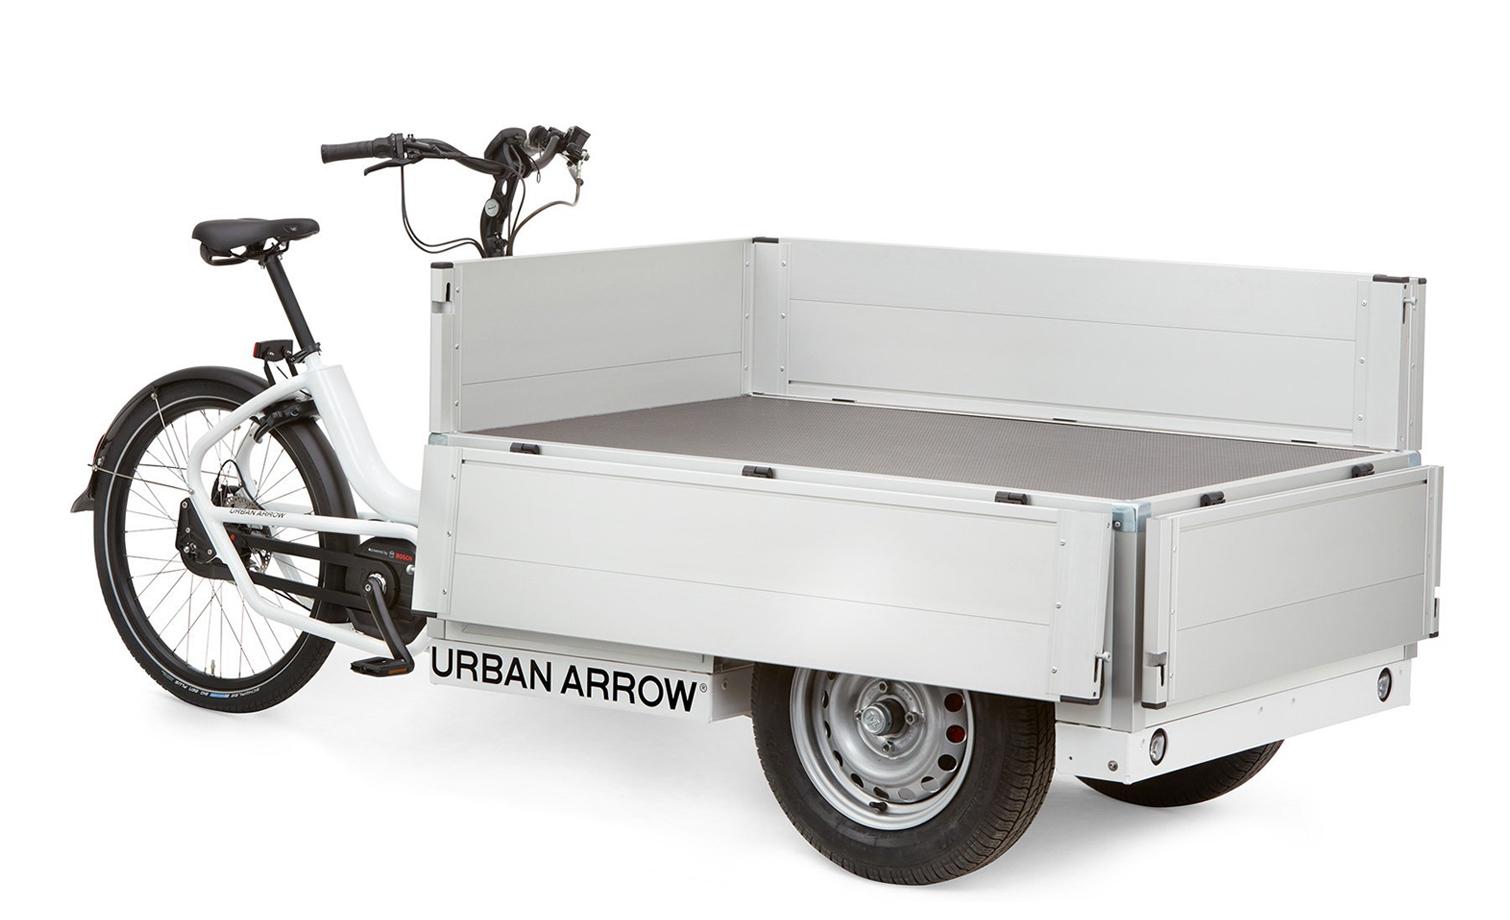 Triporteur Urban Arrow Tender 1000